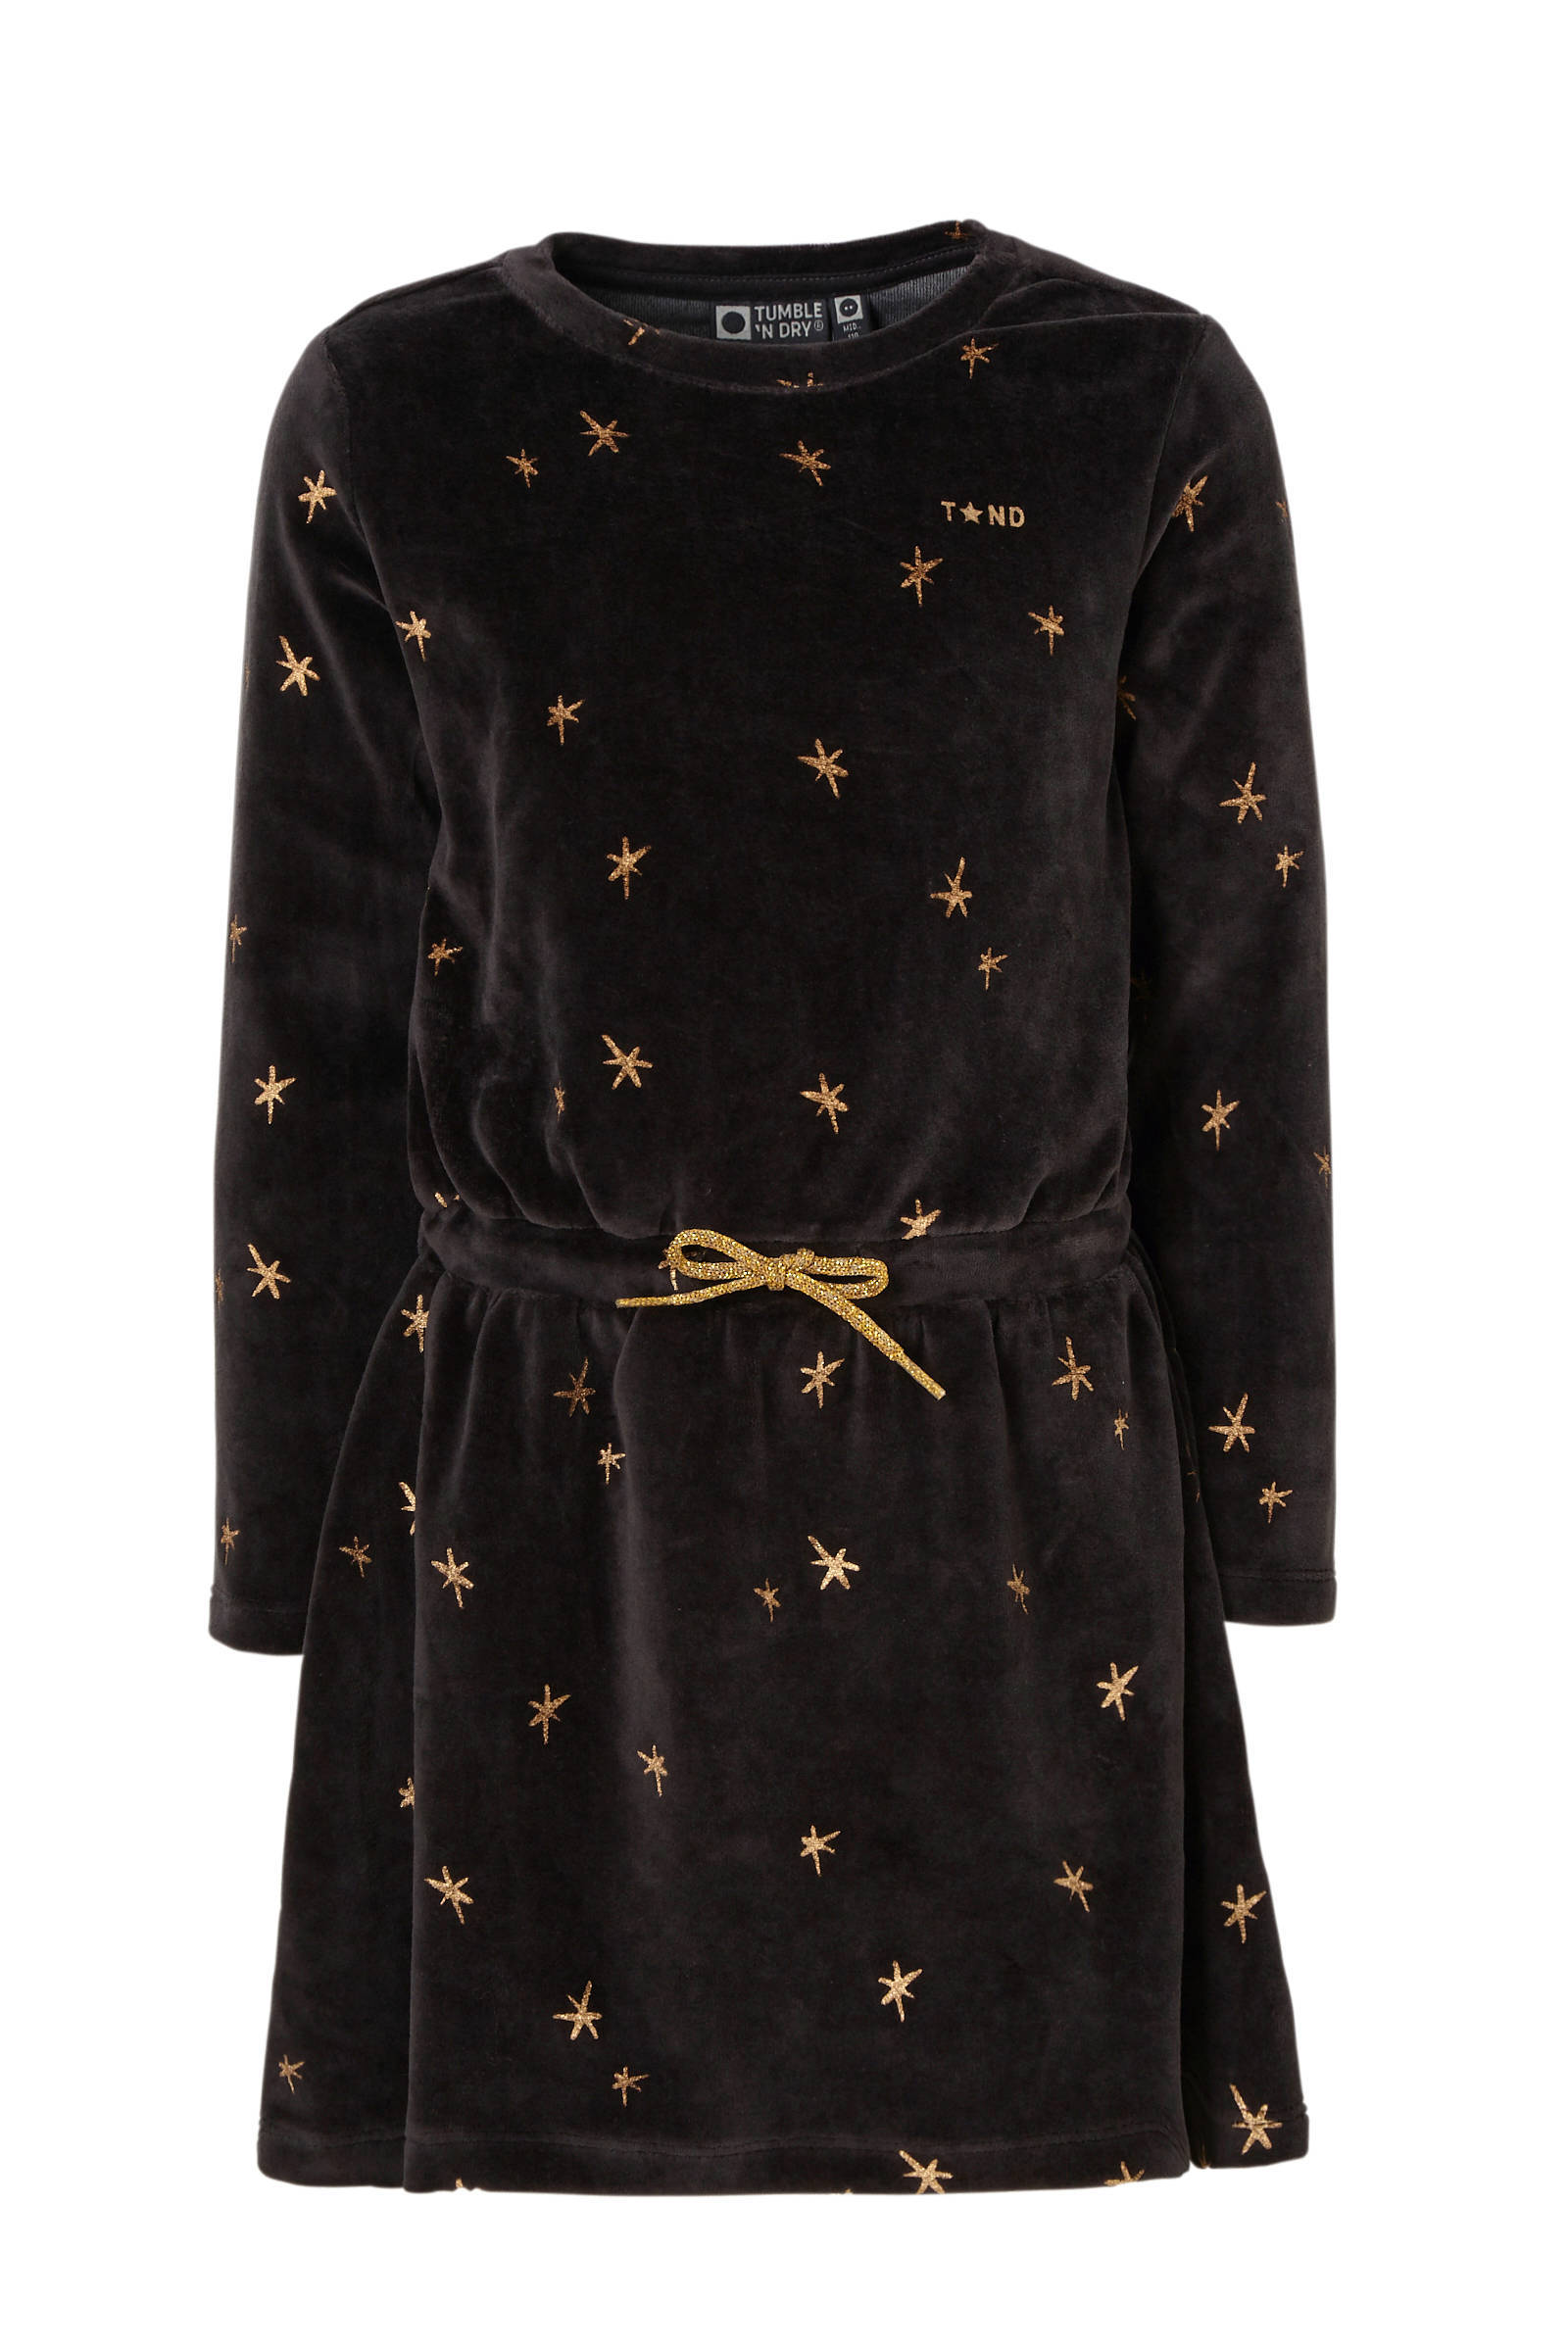 Tumble 'n Dry Mid jurk Verna van fluweel